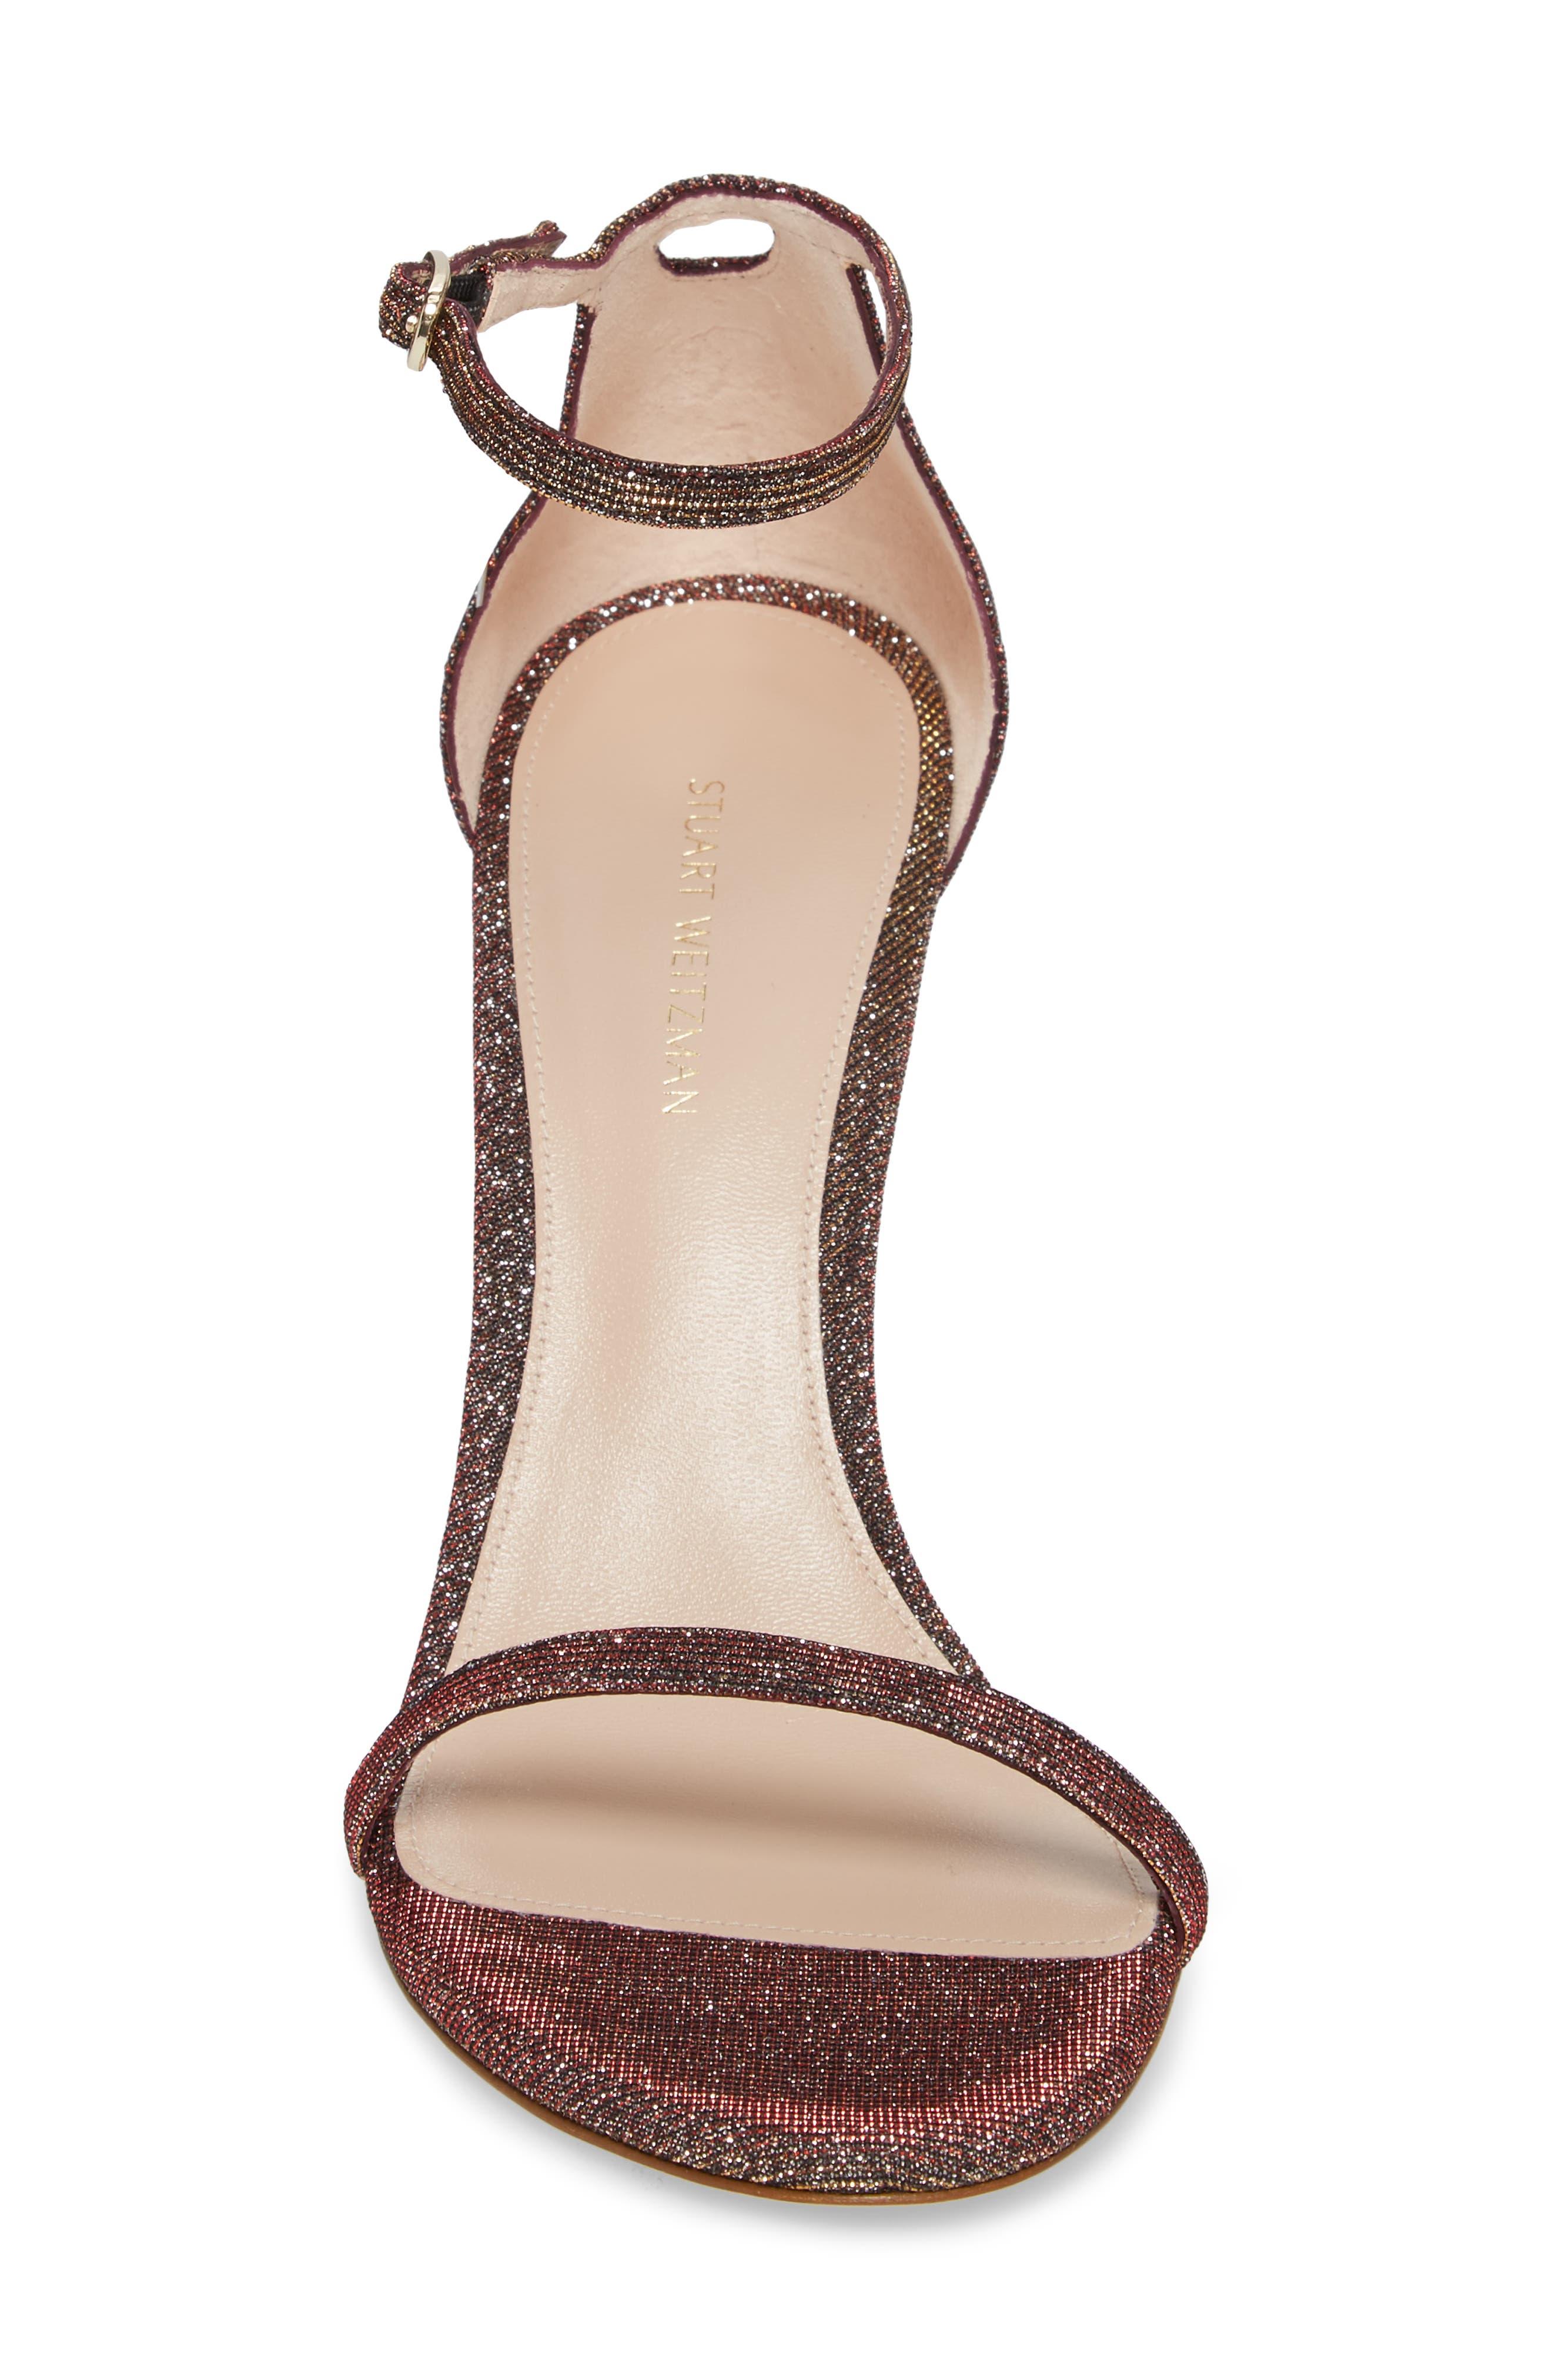 Nudistsong Ankle Strap Sandal,                             Alternate thumbnail 134, color,